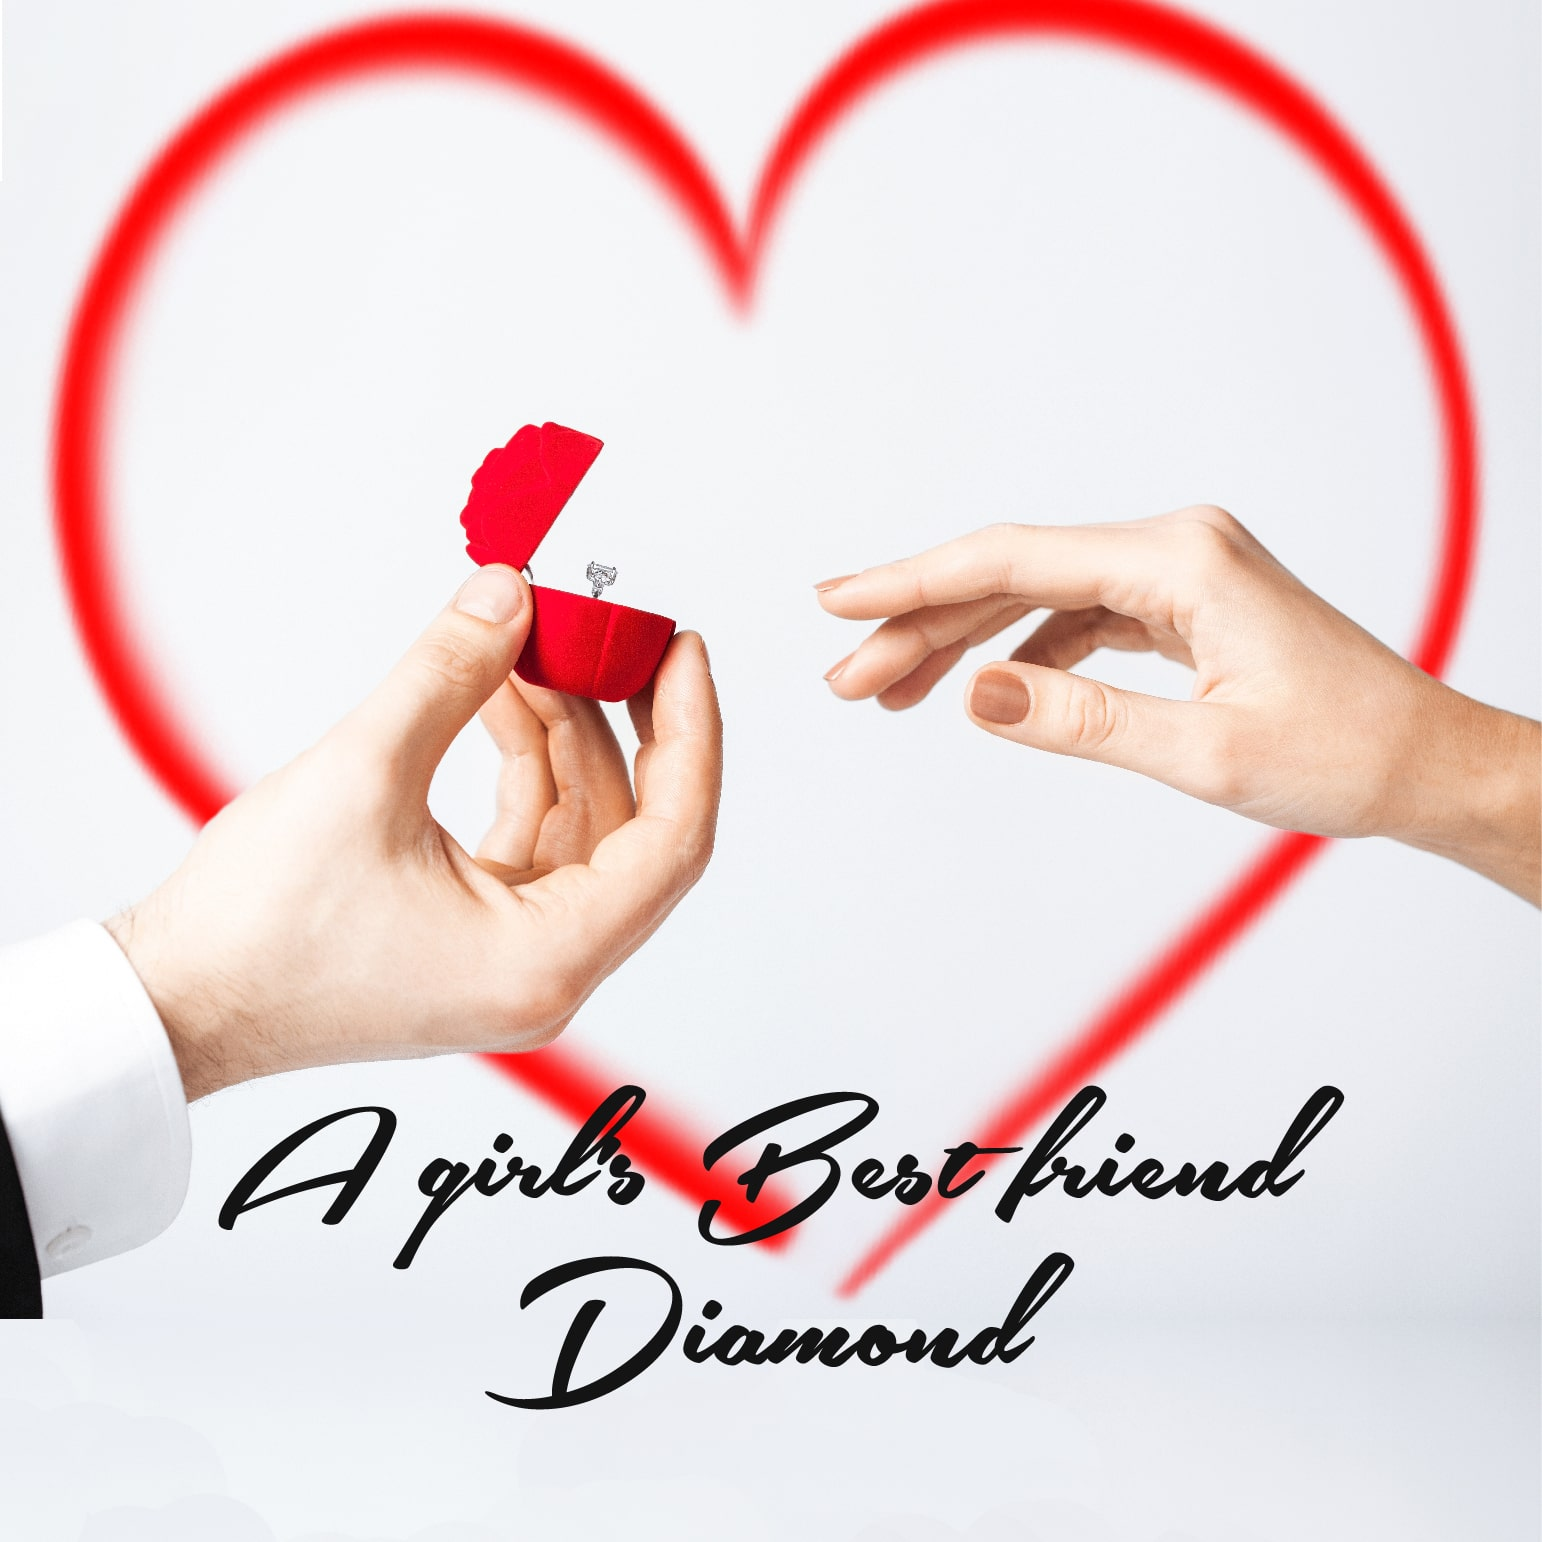 A Girl's Best Friend - Diamonds